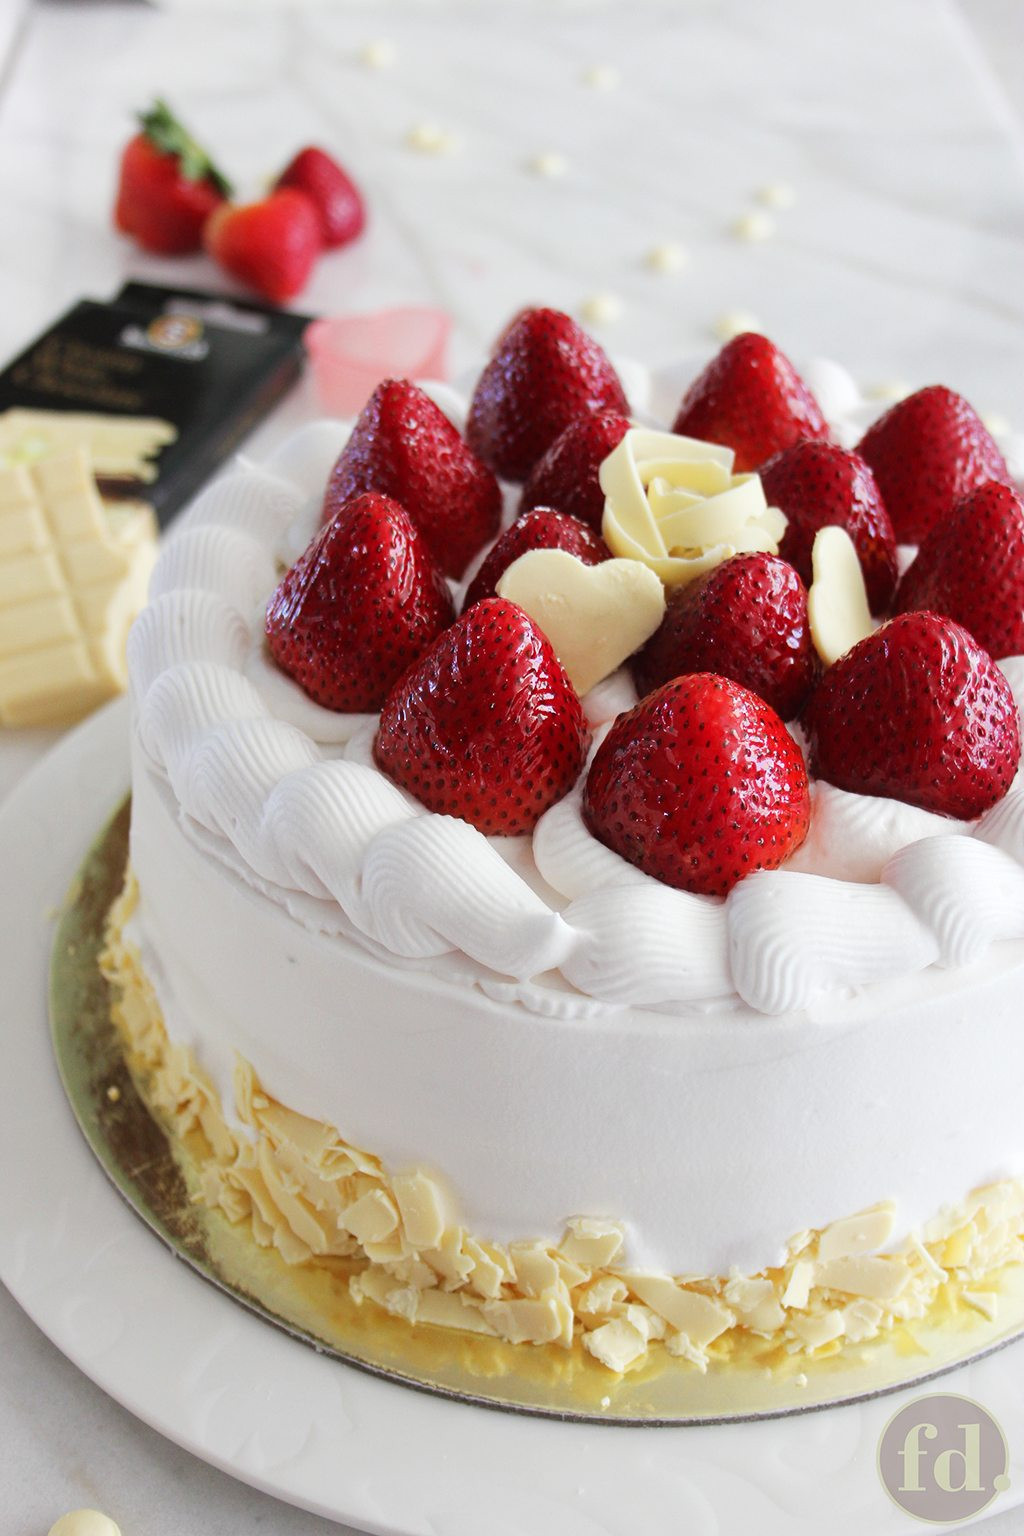 Strawberry Shortcake Videos  Delicious Japanese strawberry shortcake